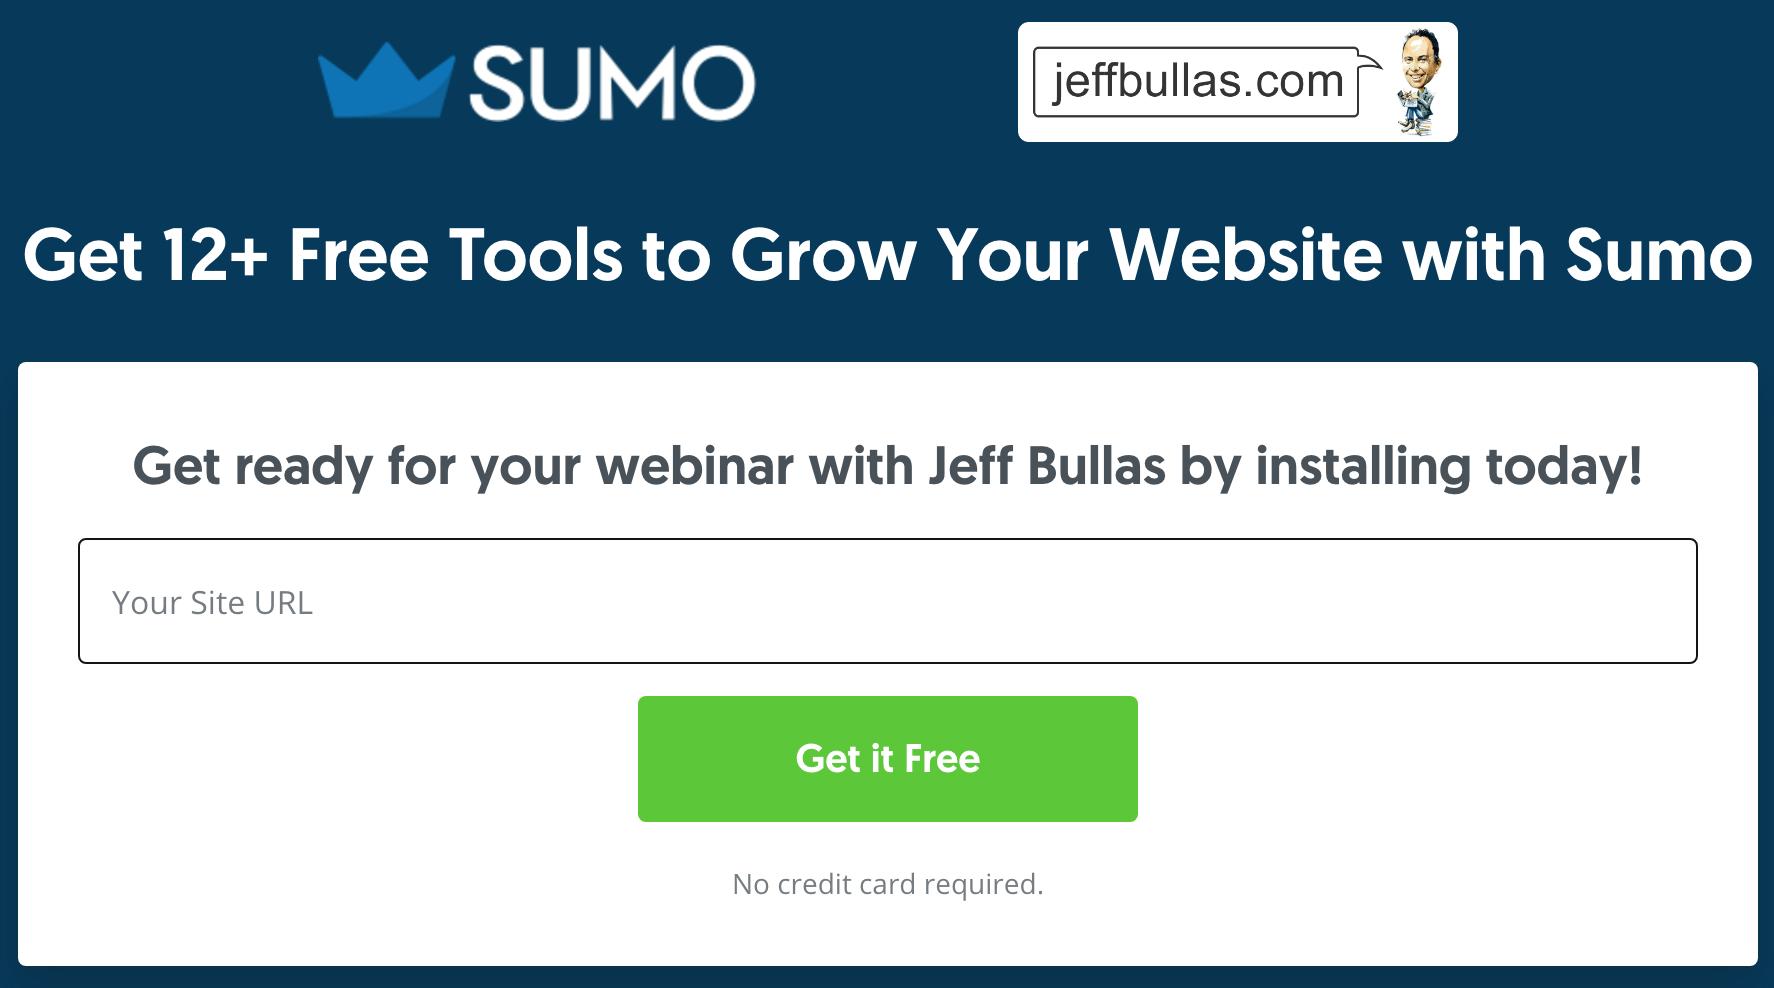 Screenshot showing a CTA on Sumo.com